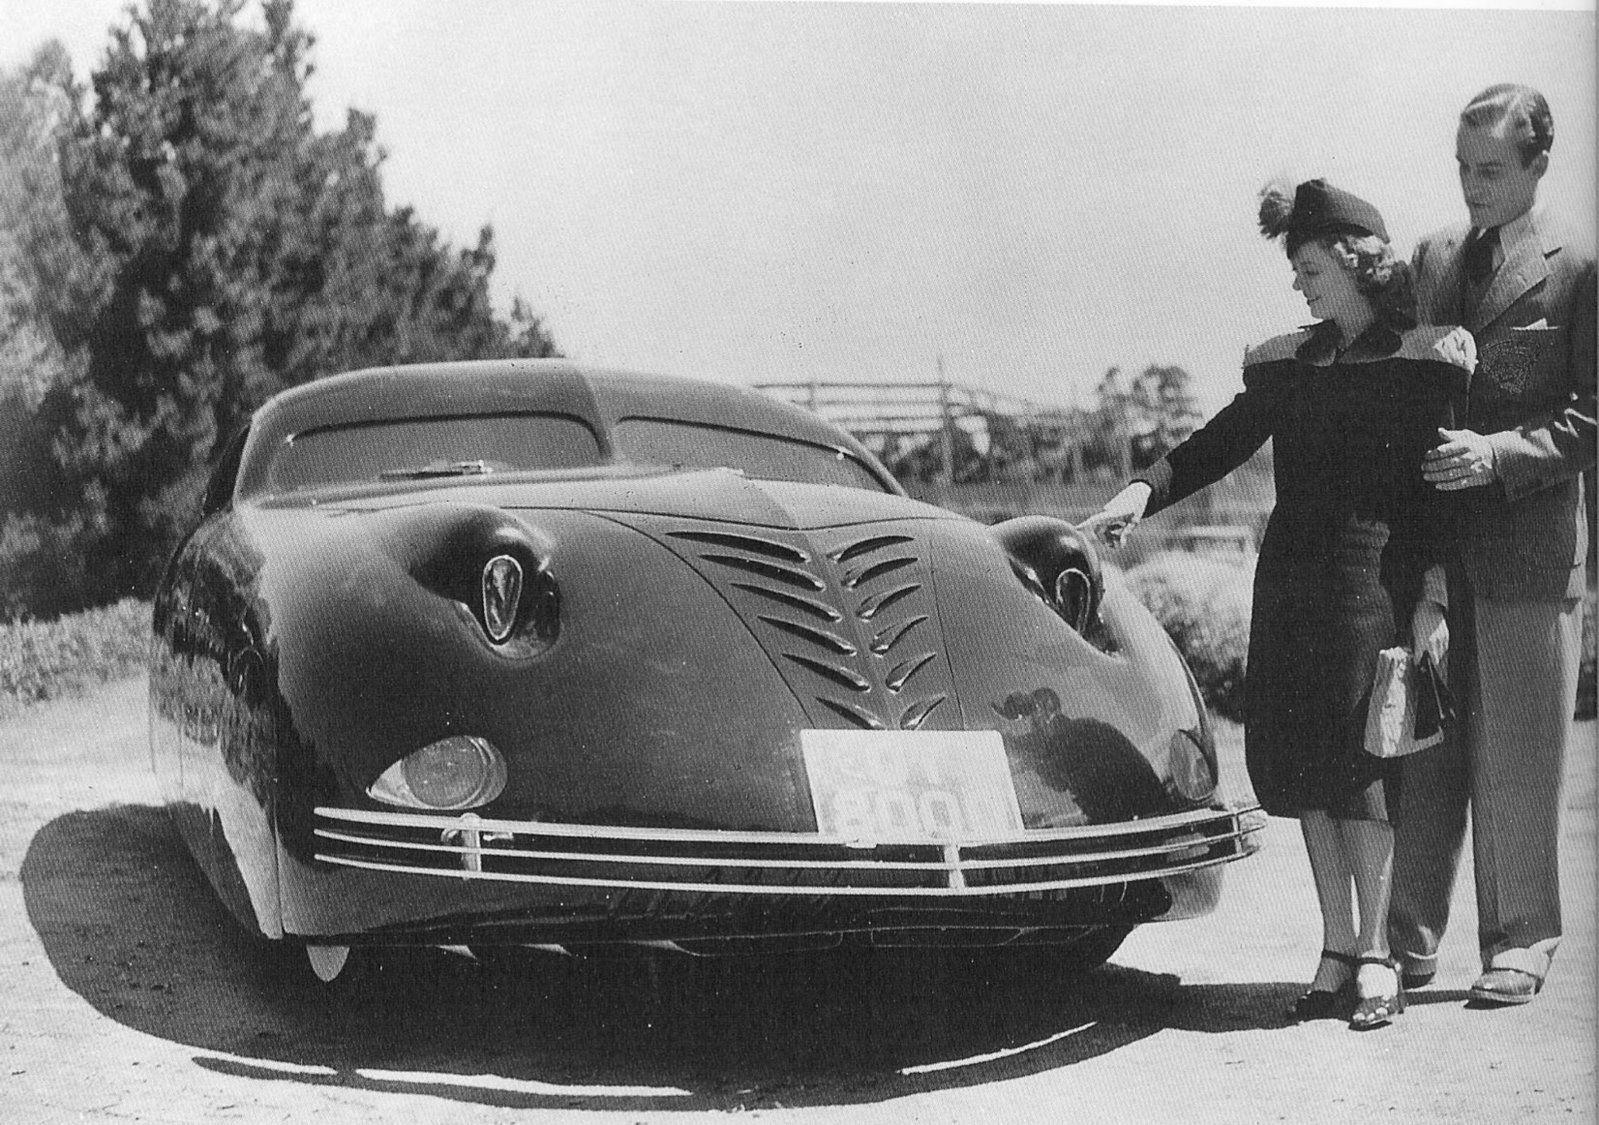 The 1938 Phantom Corsair